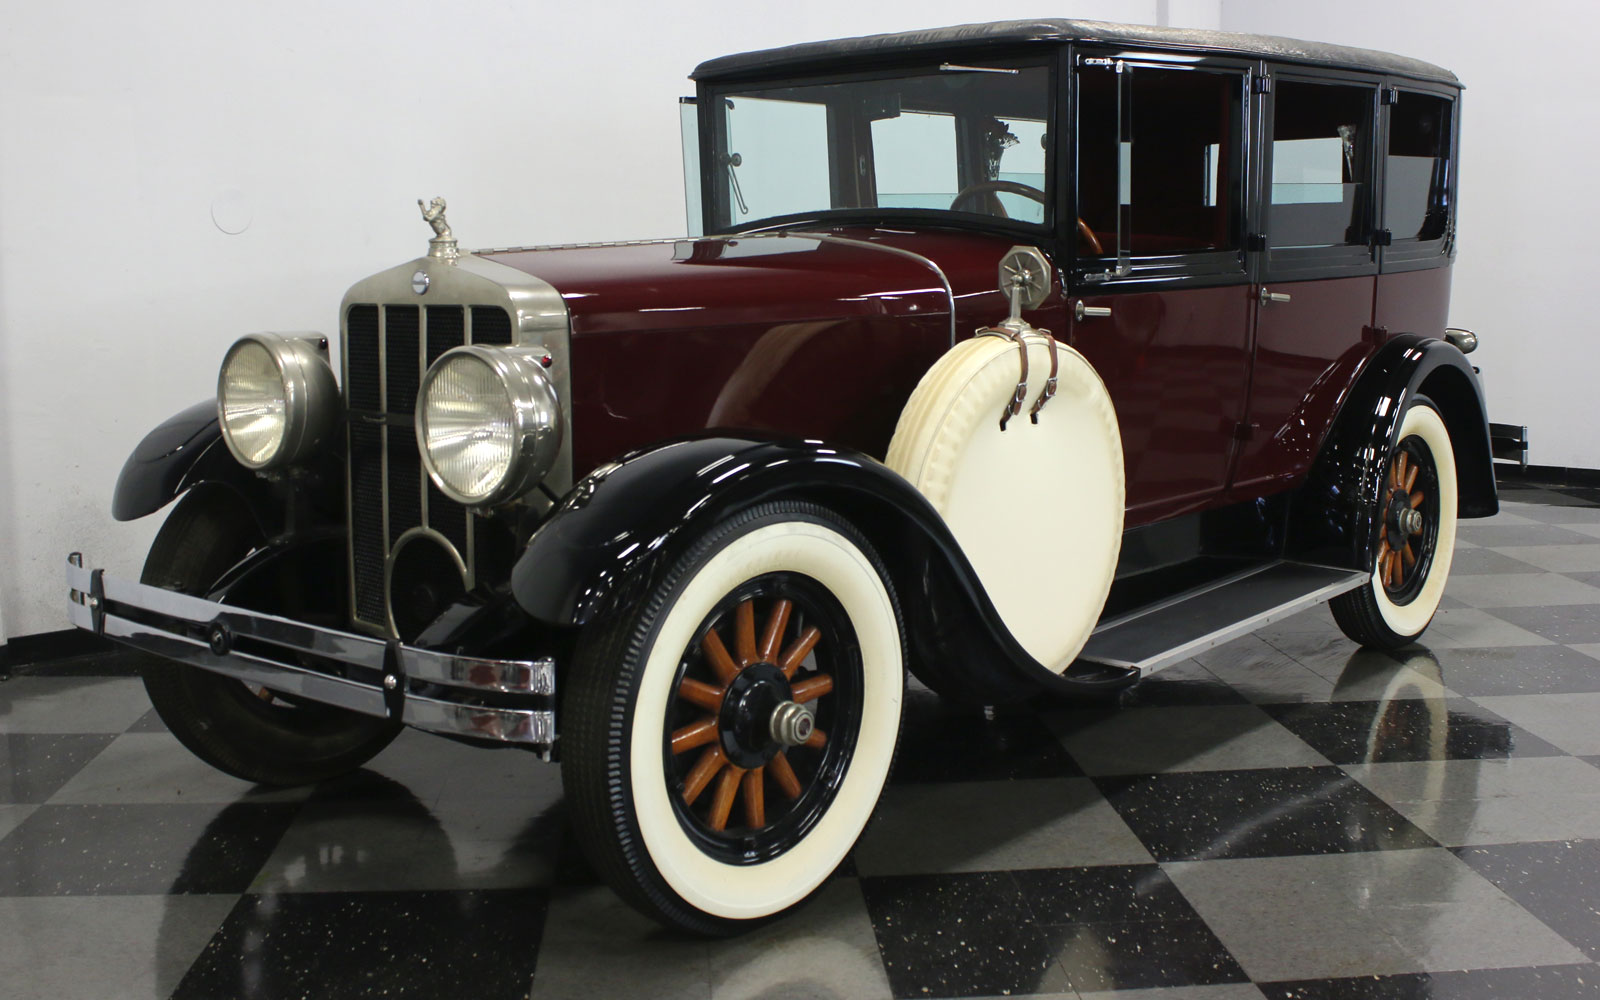 1927 Franklin Touring Airman: Vintage Innovation - My Dream Car